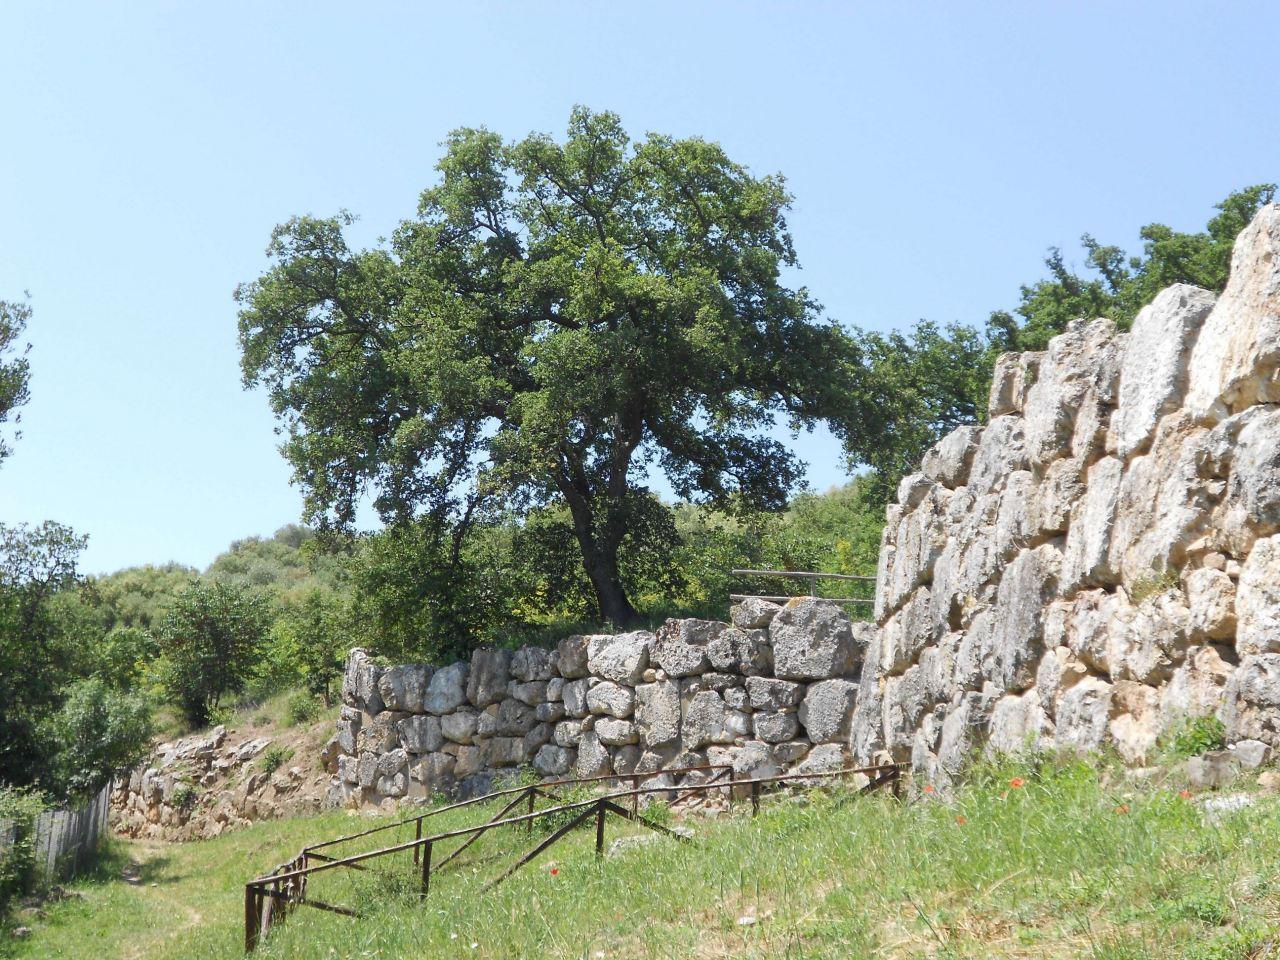 Roselle-Mura-Megalitiche-Roselle-Grosseto-Toscana-Italia-35